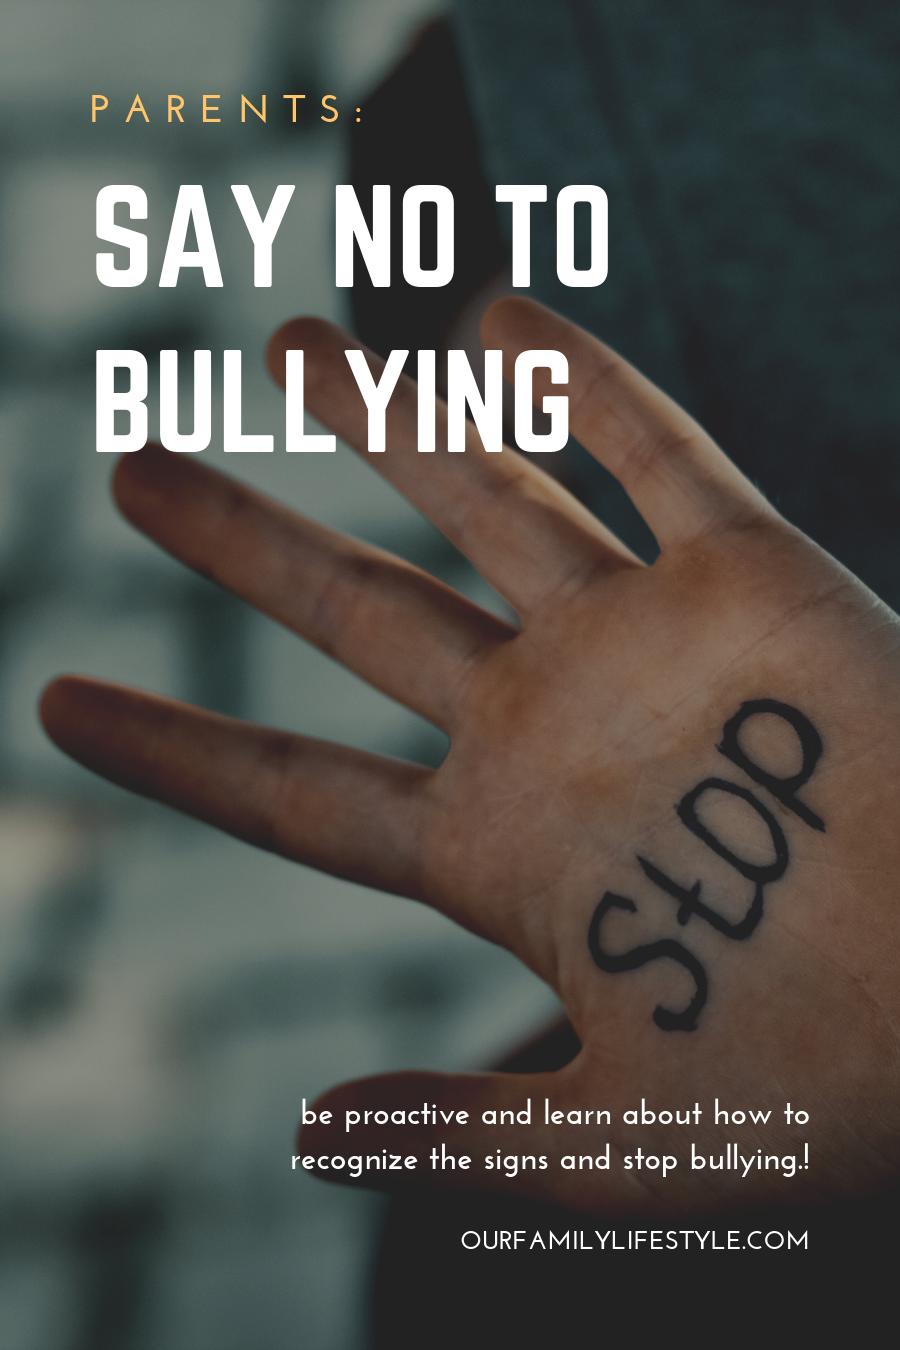 Parents - Say No To Bullying